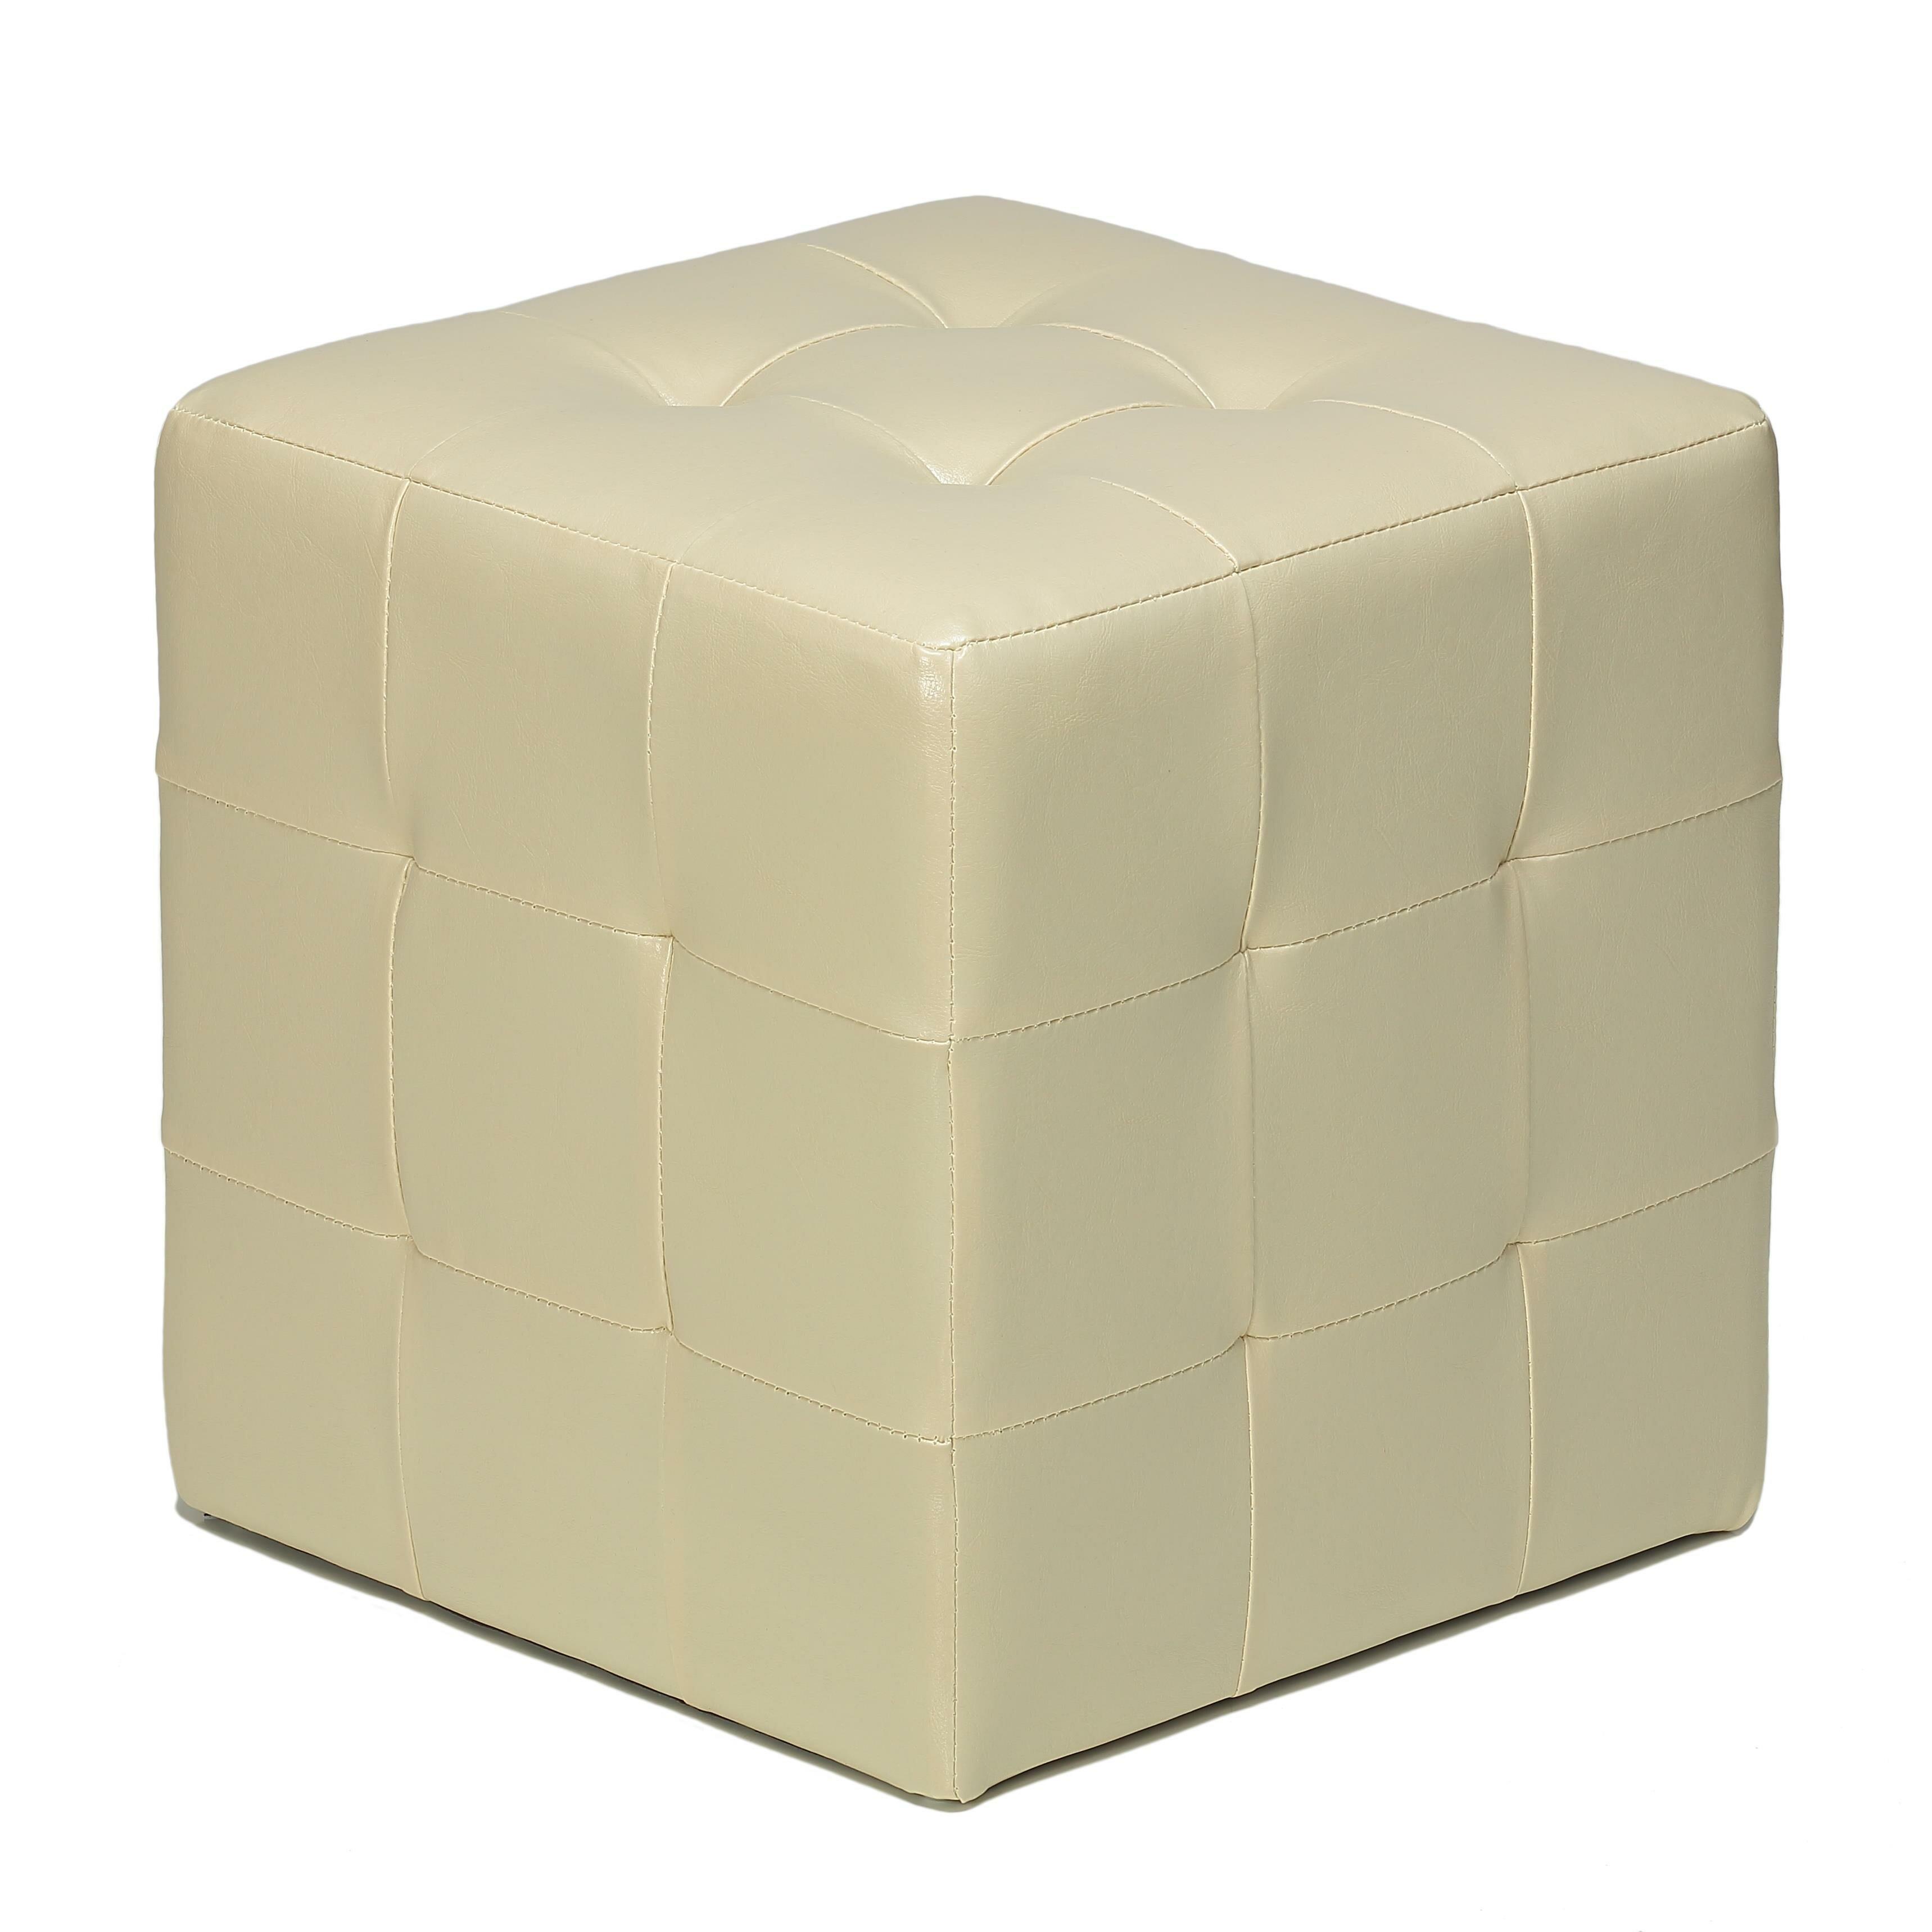 cortesi home braque cube ottoman reviews wayfair. Black Bedroom Furniture Sets. Home Design Ideas